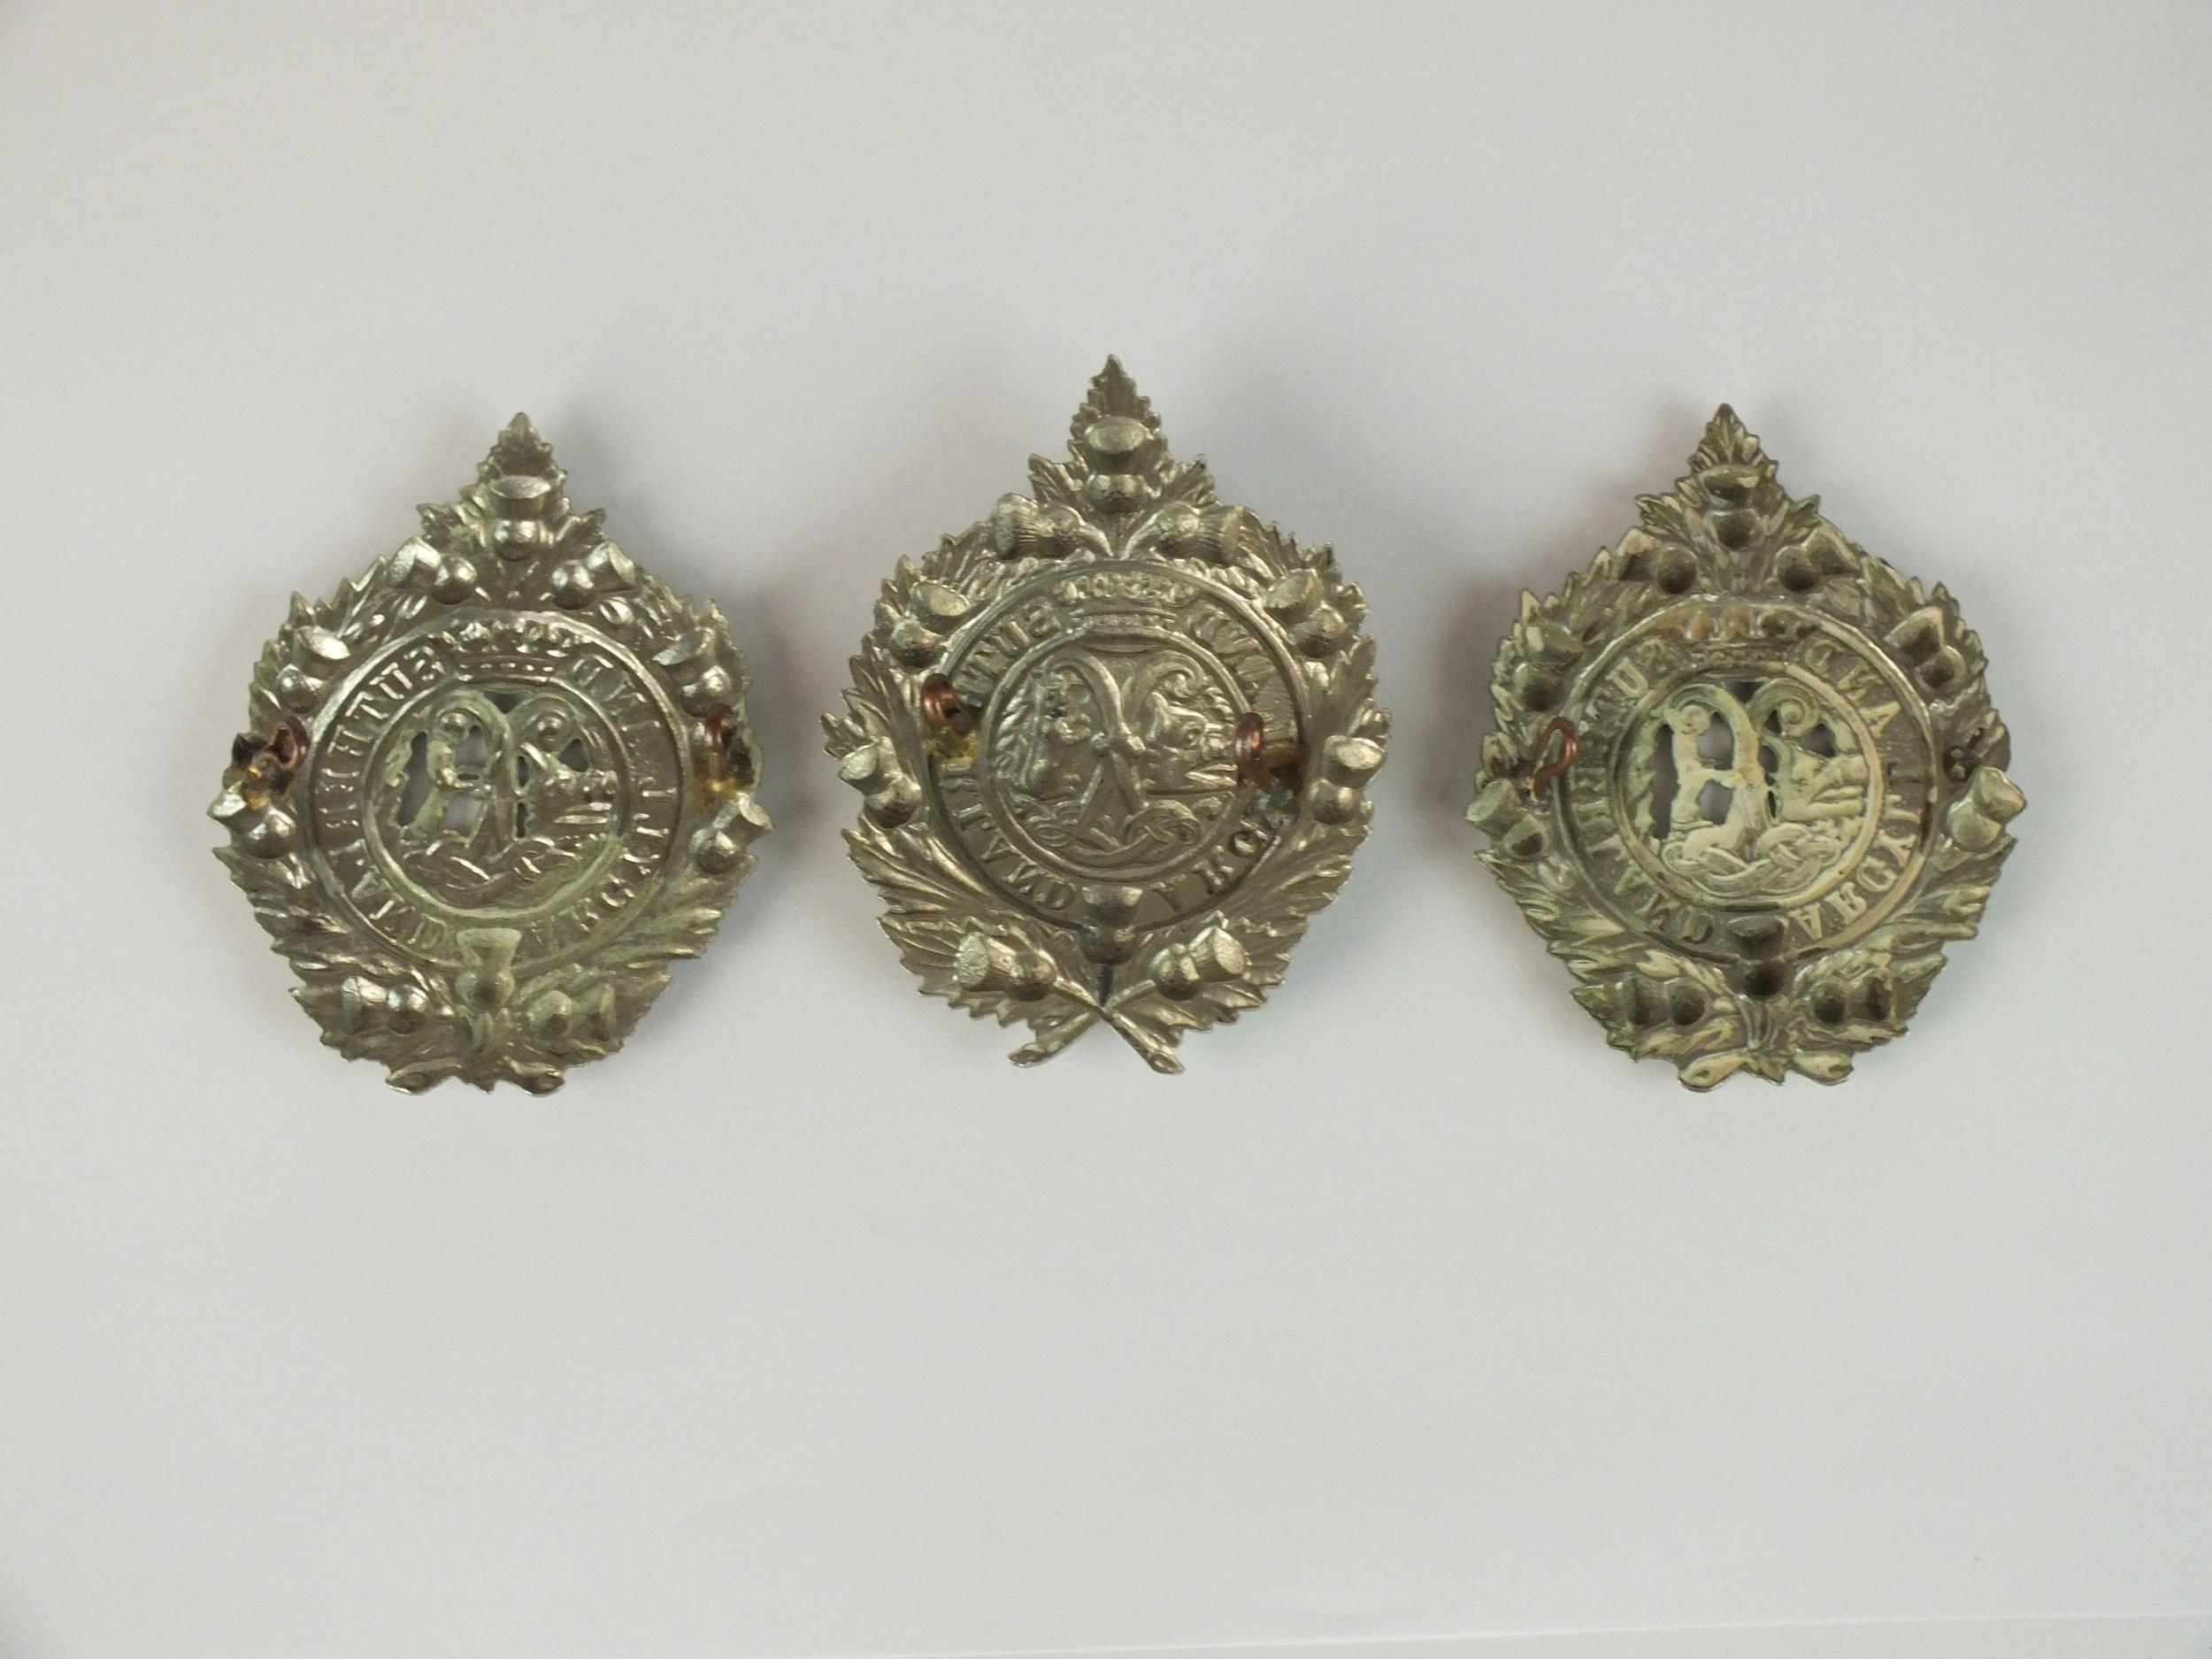 Three Argyll and Sutherland glengarry badges, die-stamped white metal (3) - Image 2 of 2